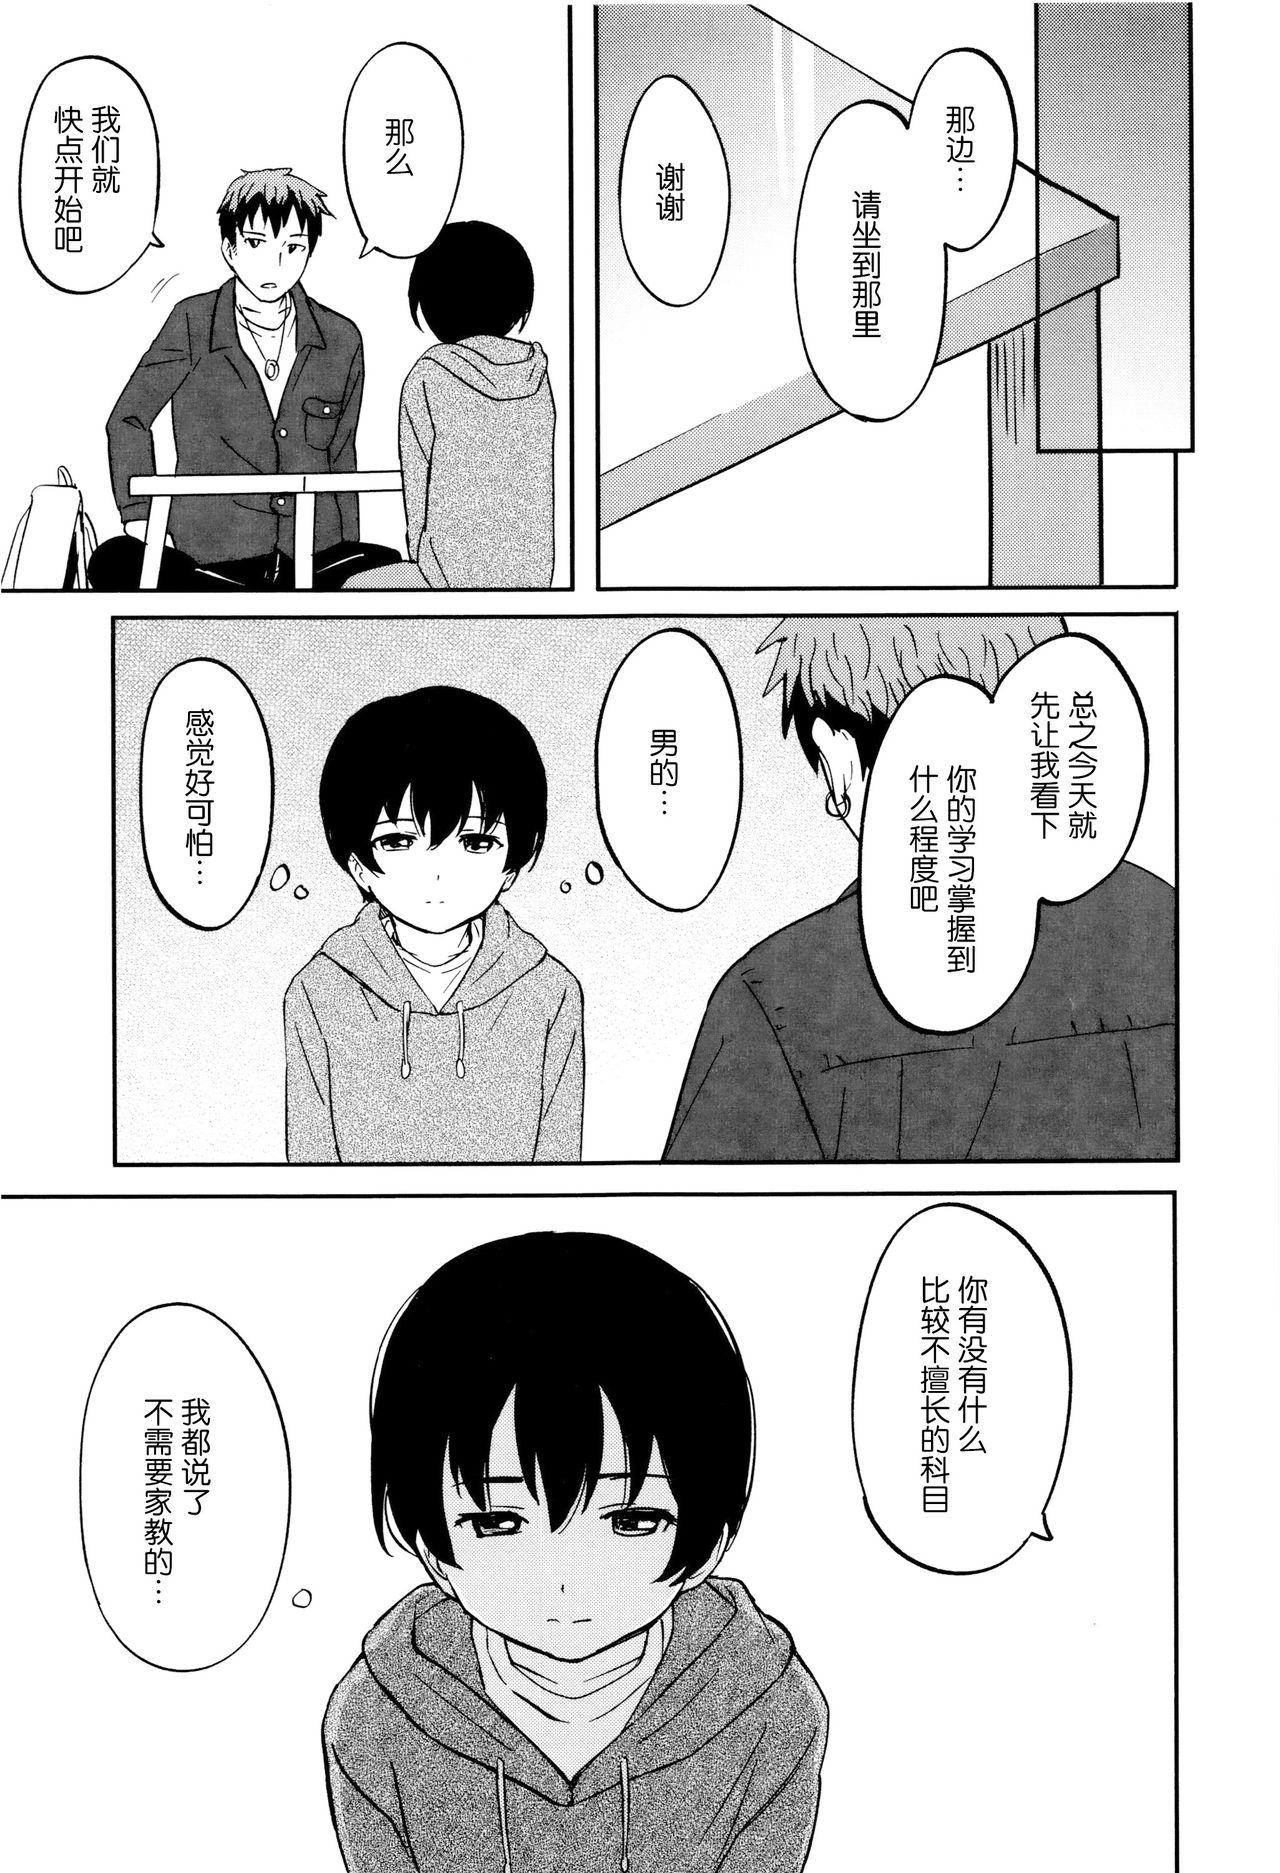 Tokubetsu na Mainichi - Special daily 135